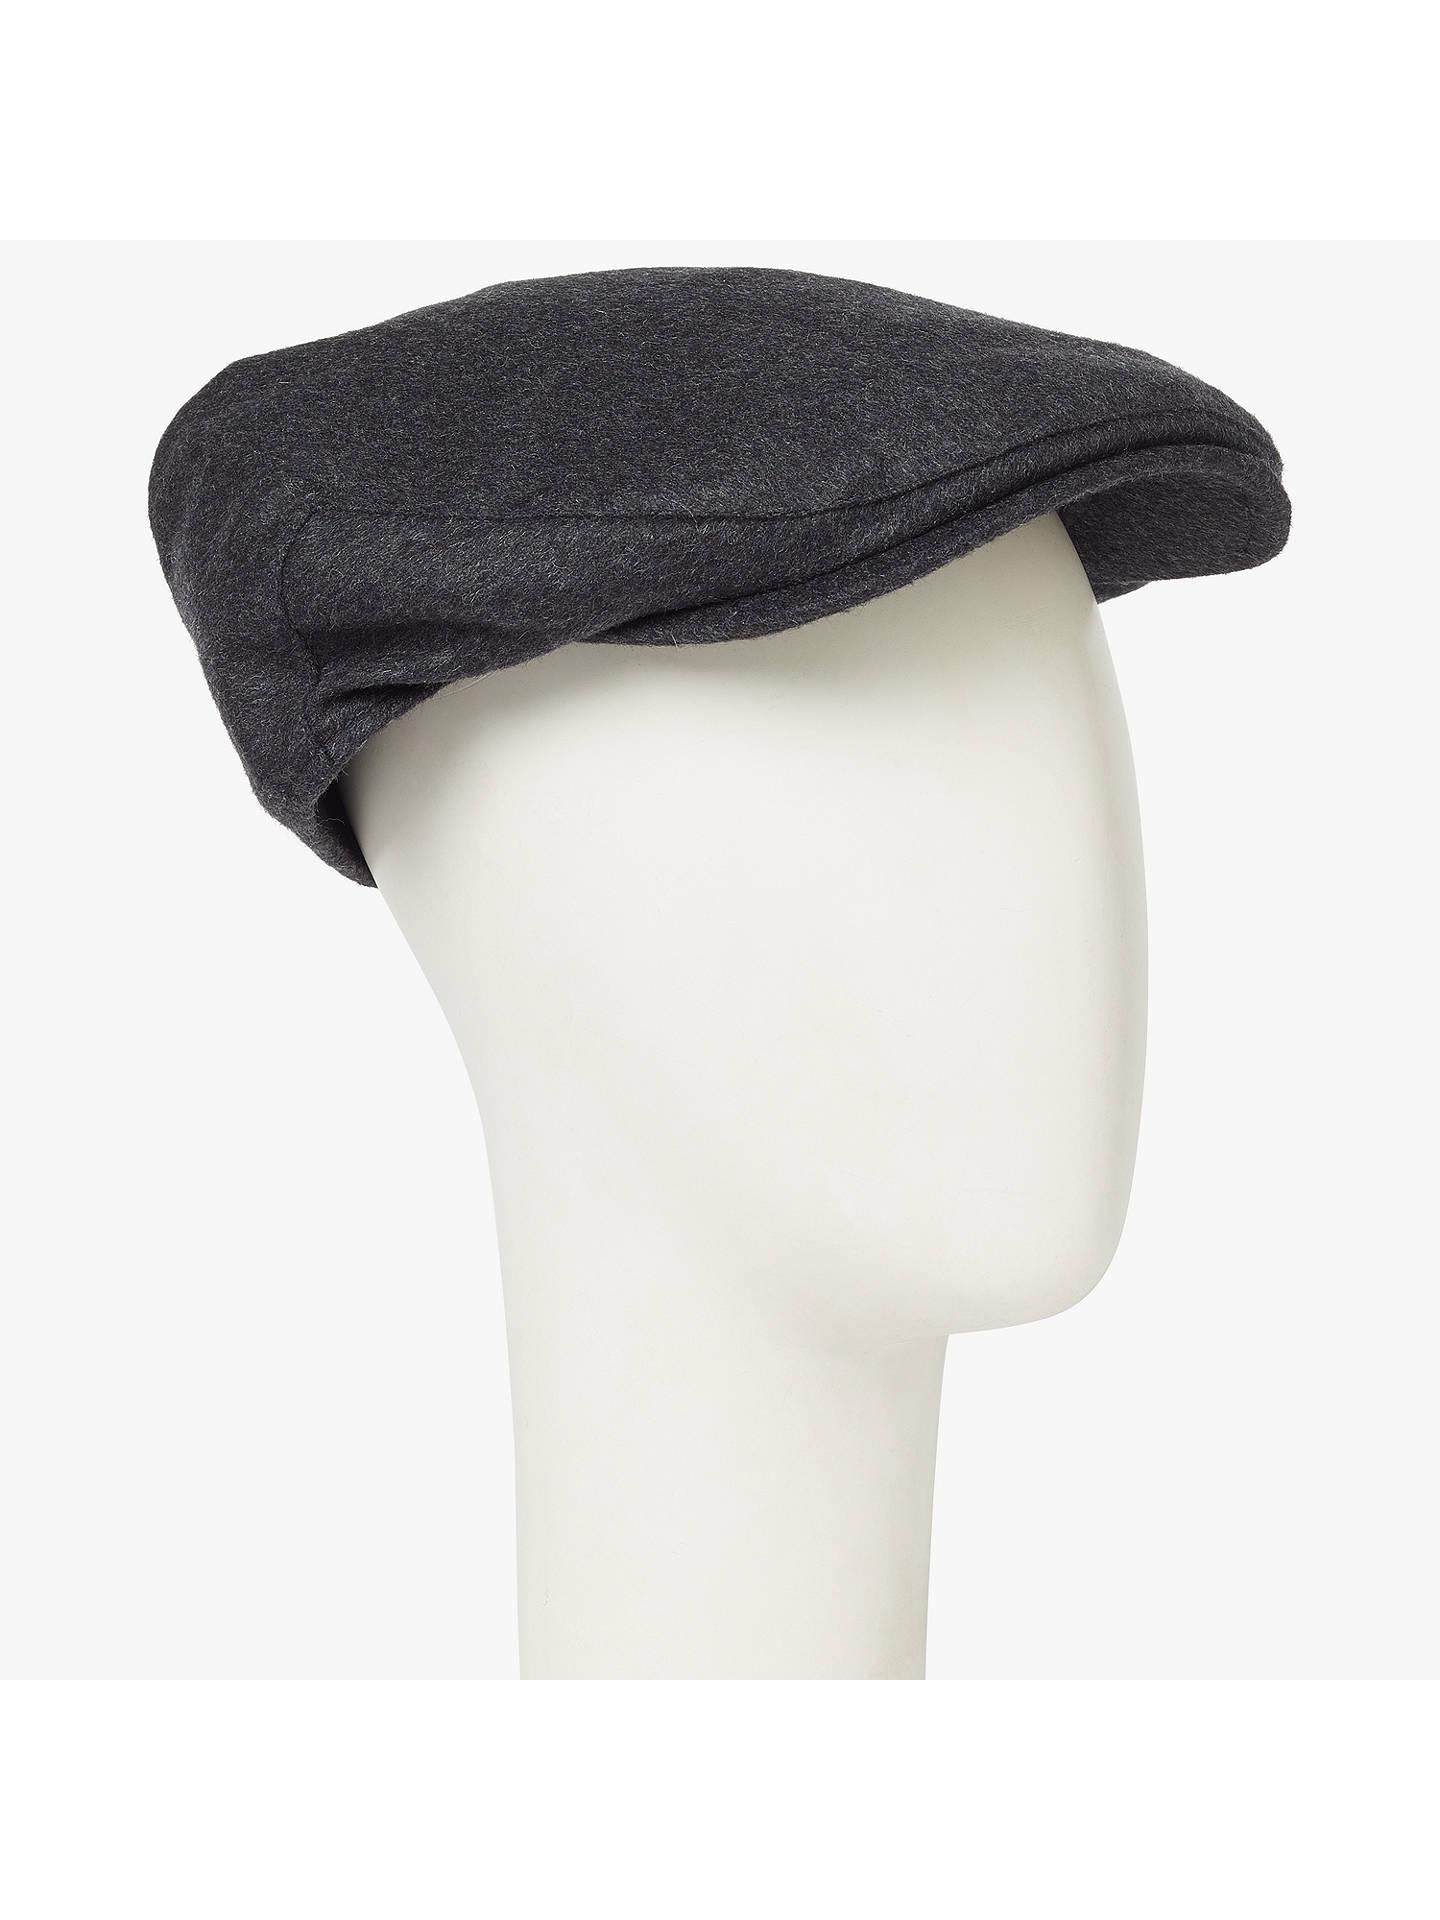 5bf1be47075b2 Buy Christys  Balmoral Cashmere Flat Cap